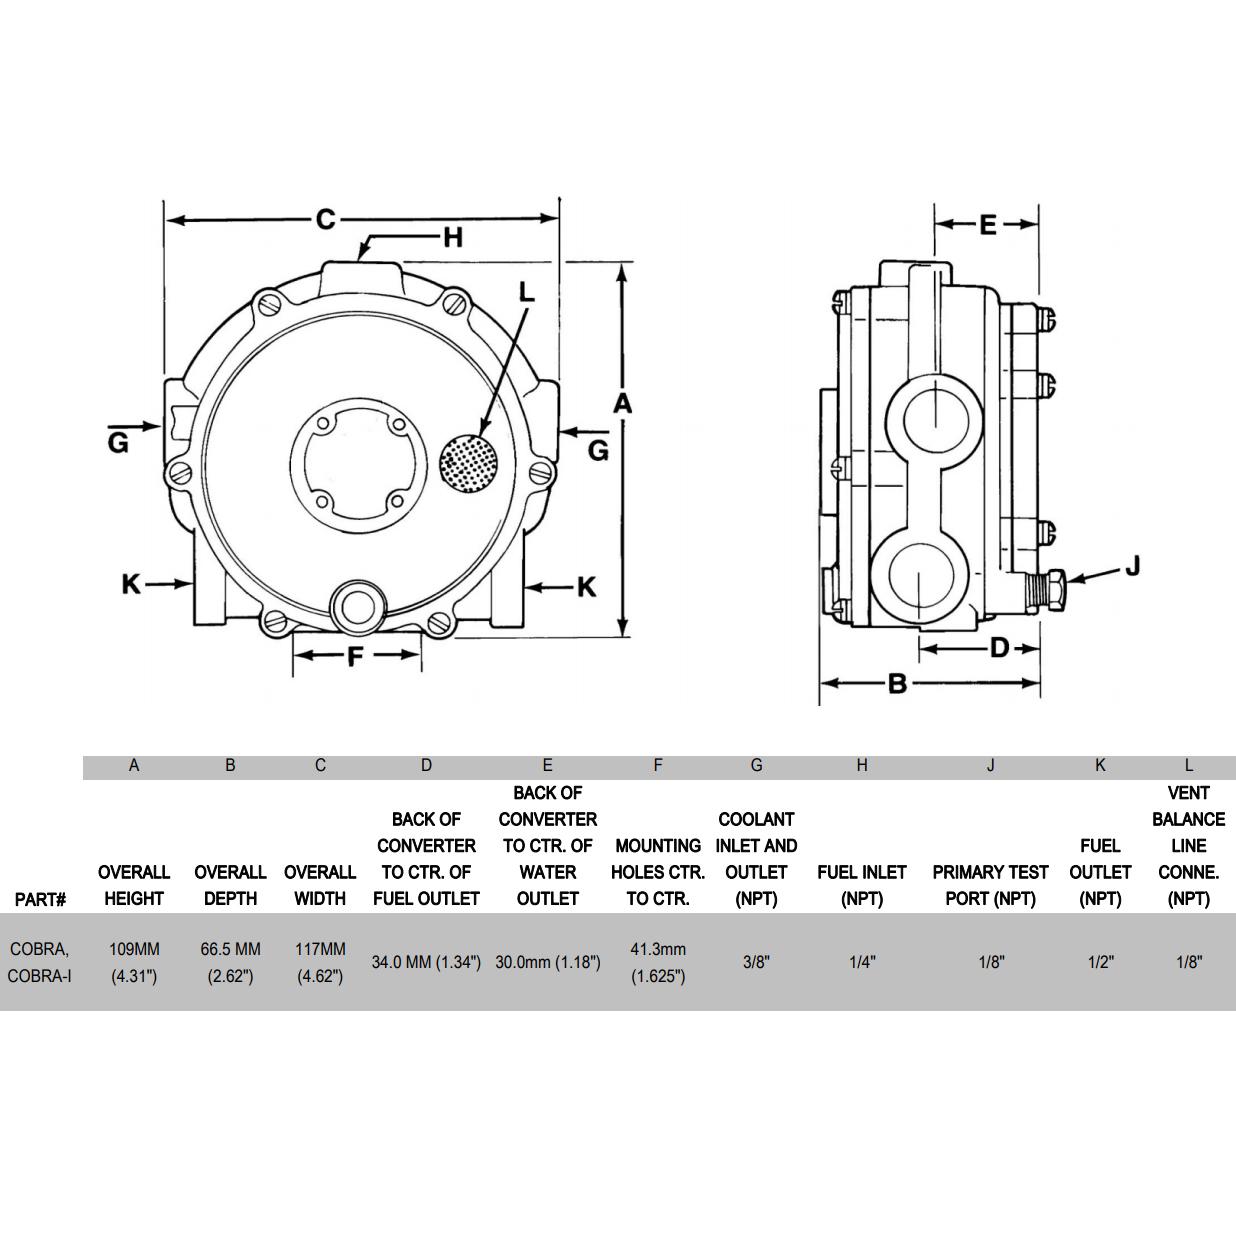 impco-cobra-dimensions.jpg